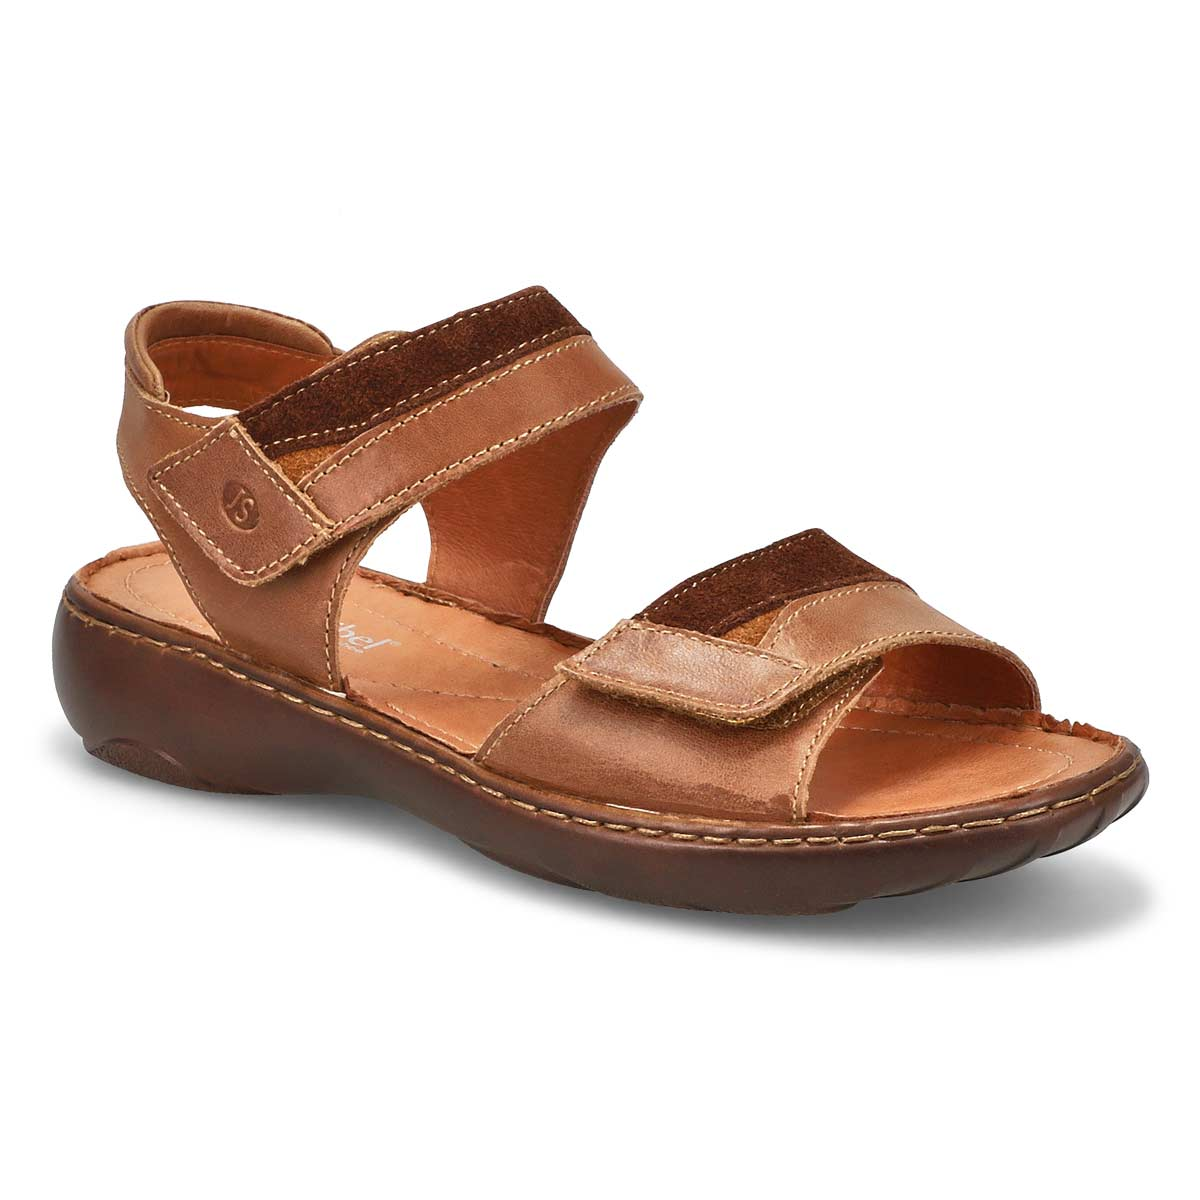 Lds Debra 19 brown casual 2 strap sandal